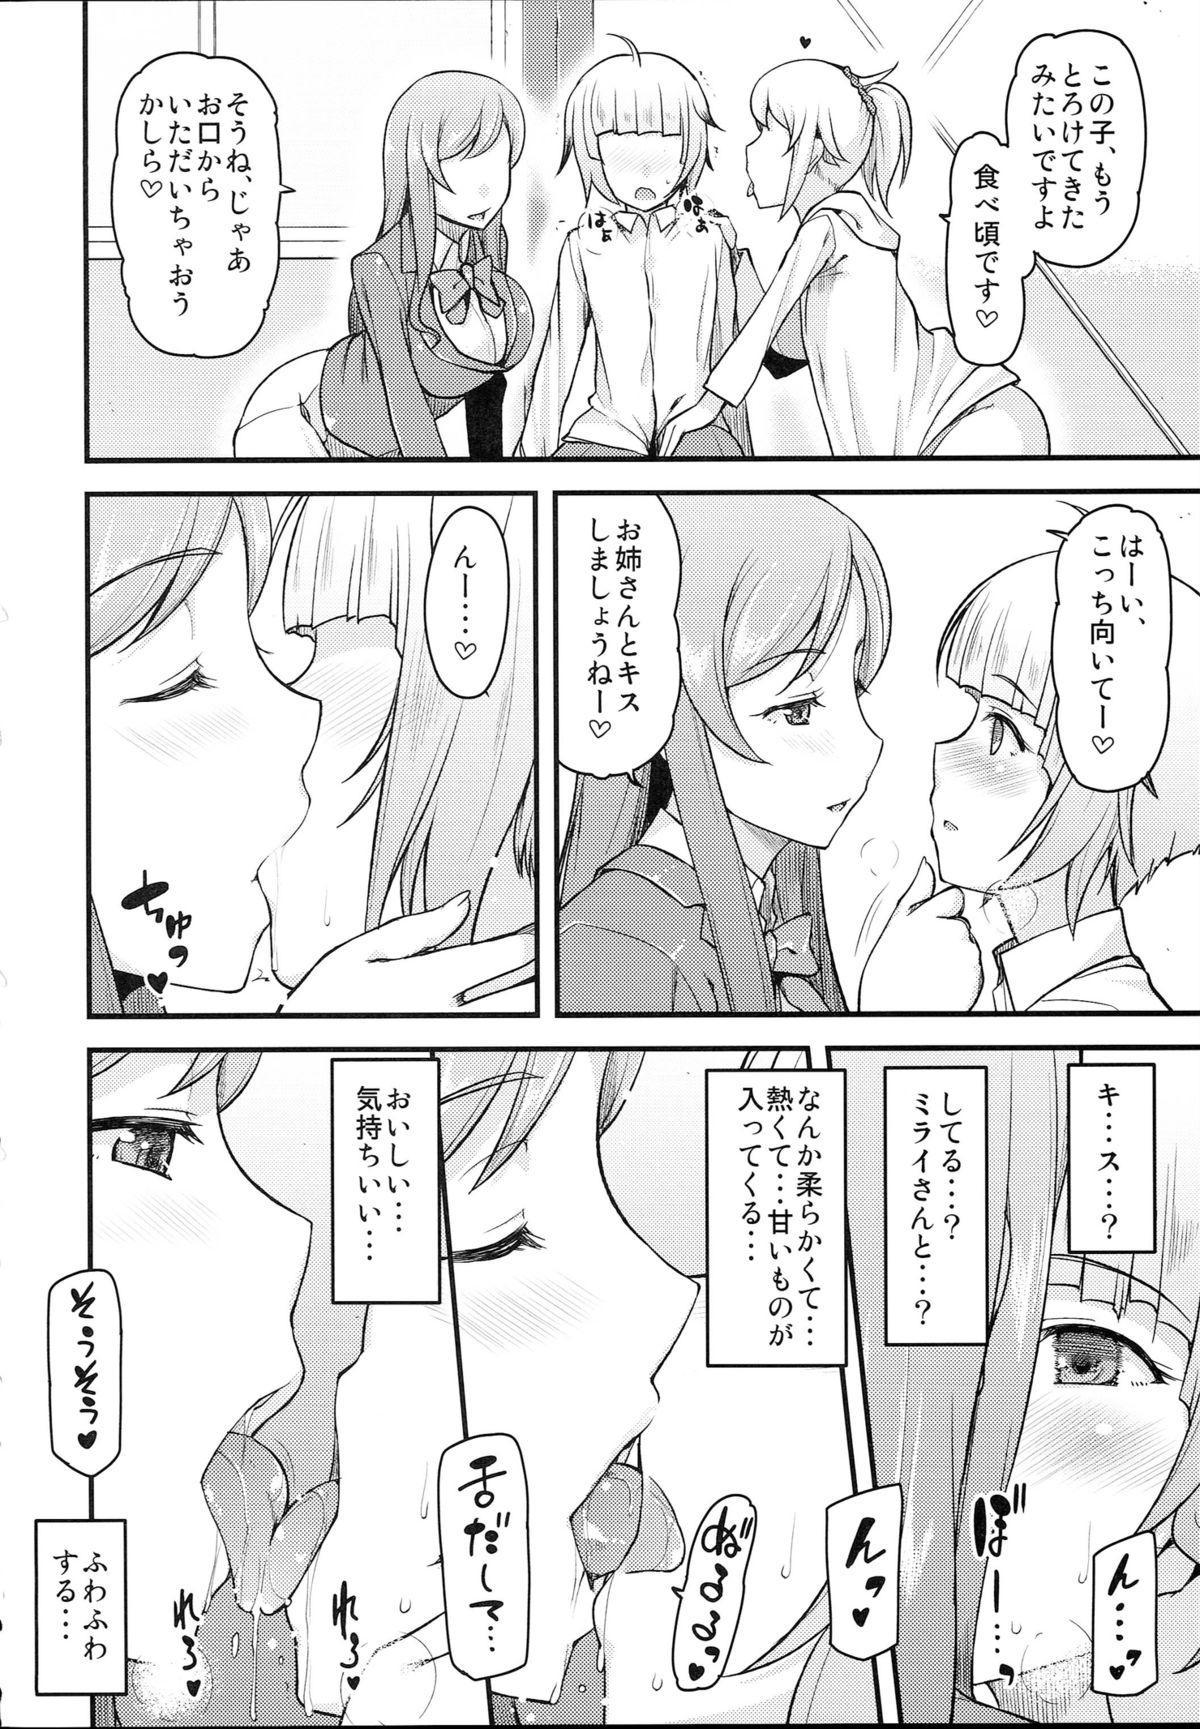 (C87) [from SCRATCH (Johnny) Amatoro Fighters Fumina senpai to Mirai oneechan no baai  (Gundam Build Fighters Try) 10